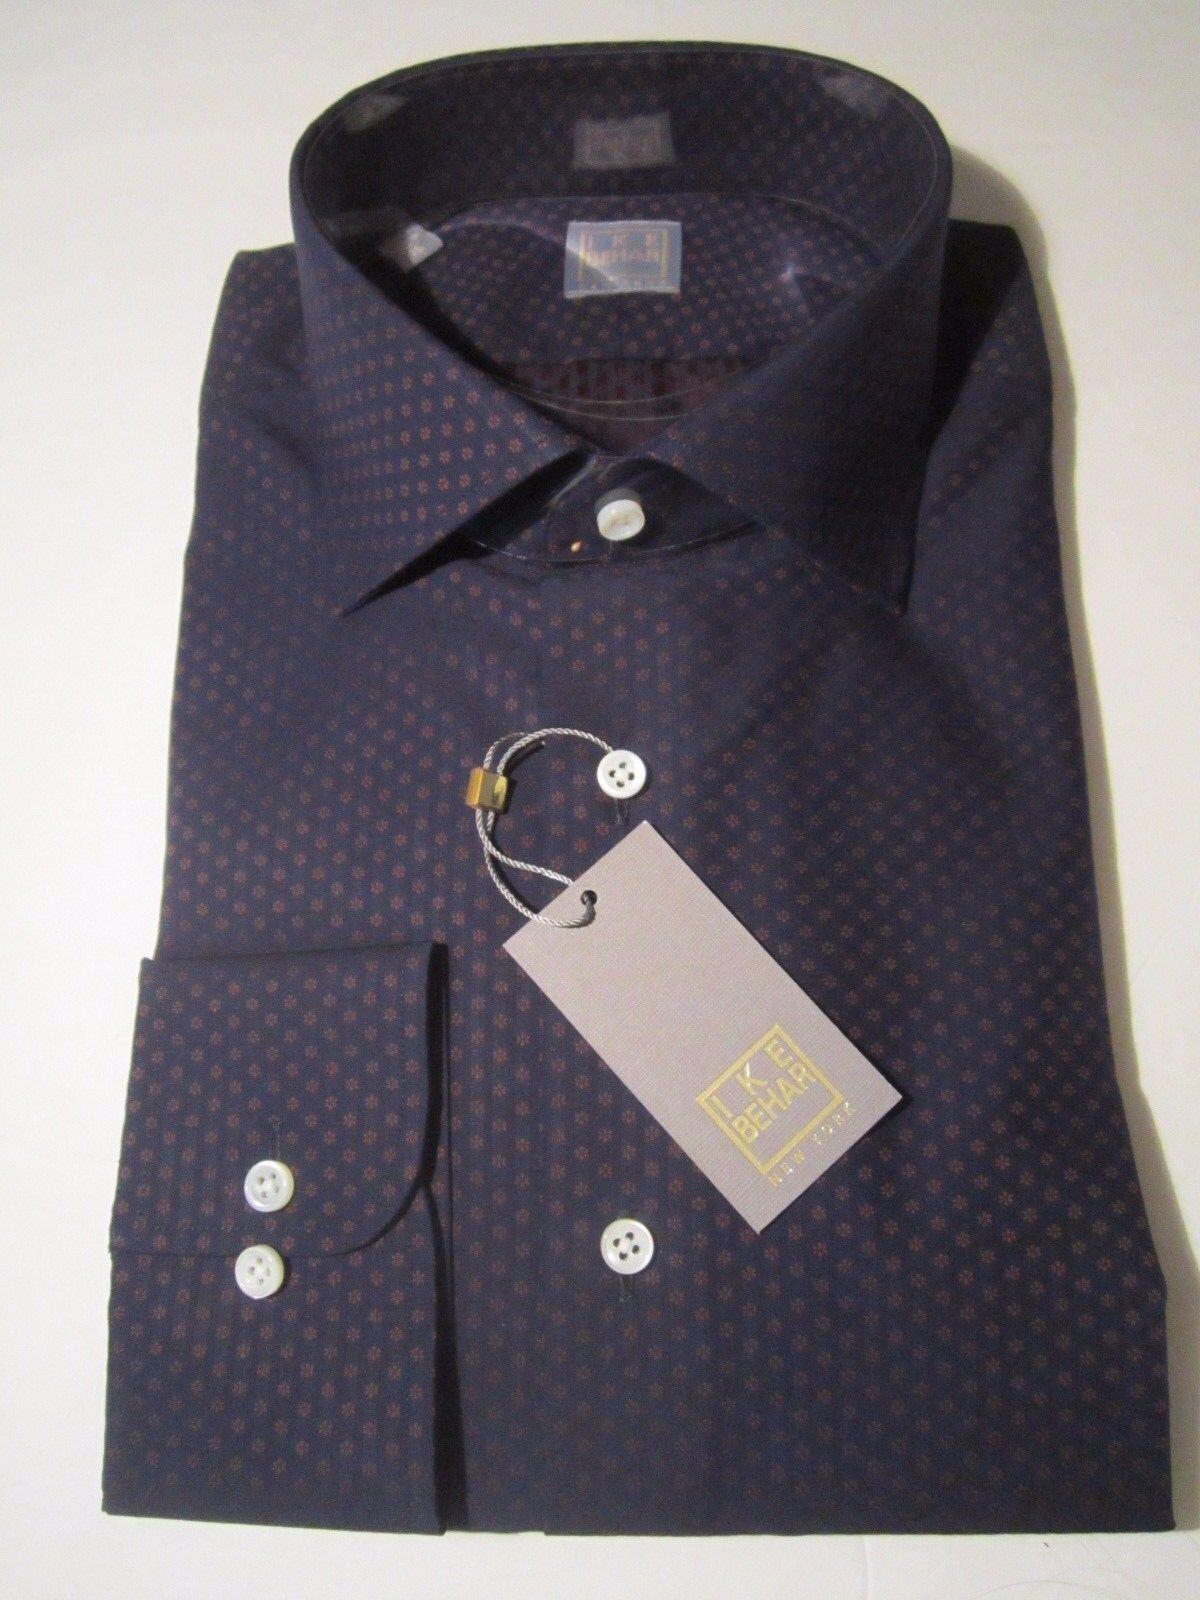 245 NWT gold label Ike Behar New York Dark bluee Dress Shirt 16 Long sleeve 36